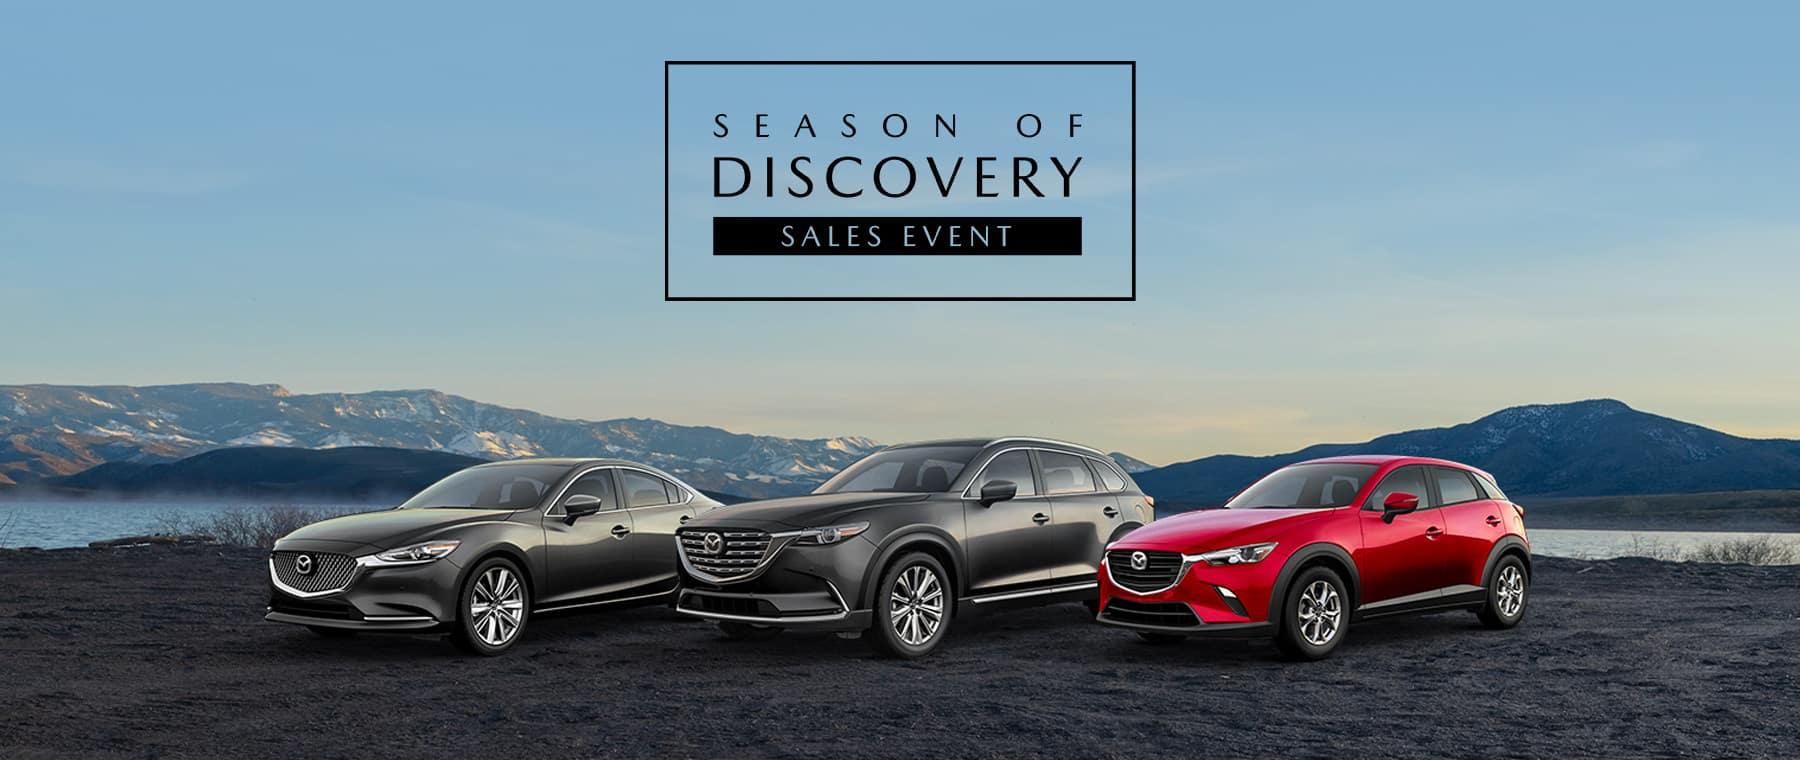 Season of Discovery